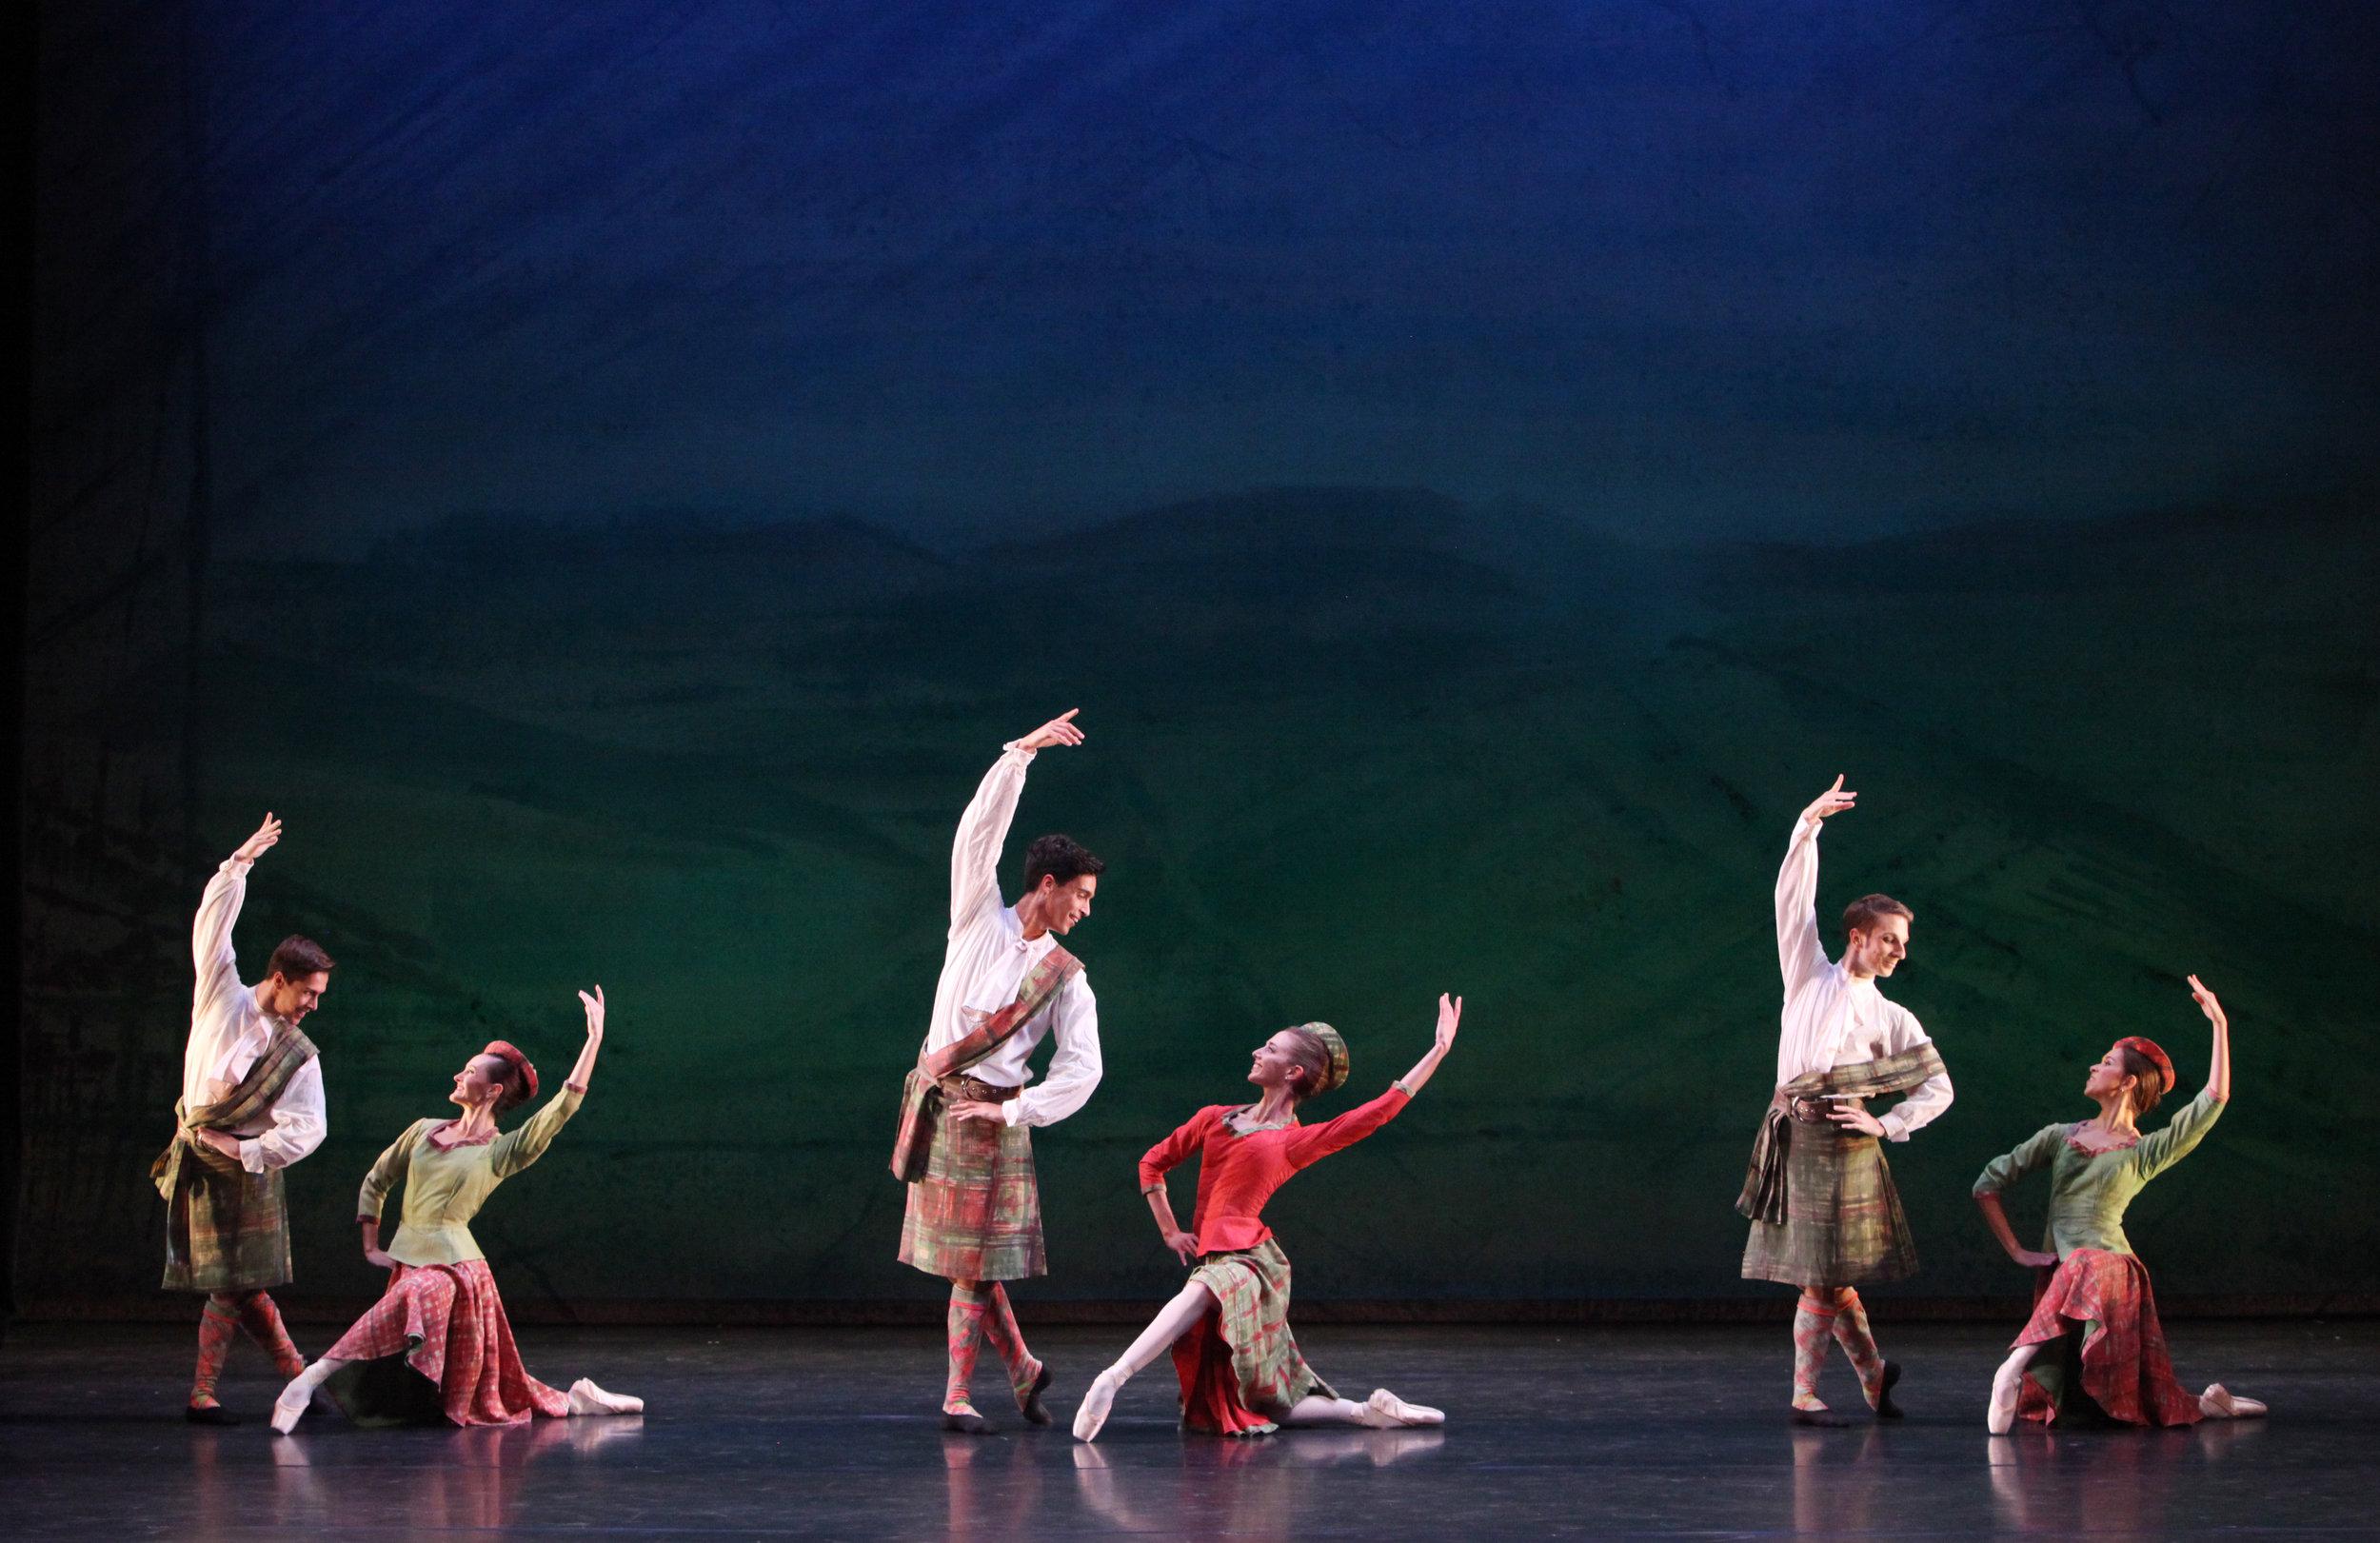 The-Sarasota-Ballet-in-David-Bintleys-Four-Scottish-Dances-Photography-Frank-Atura.jpg